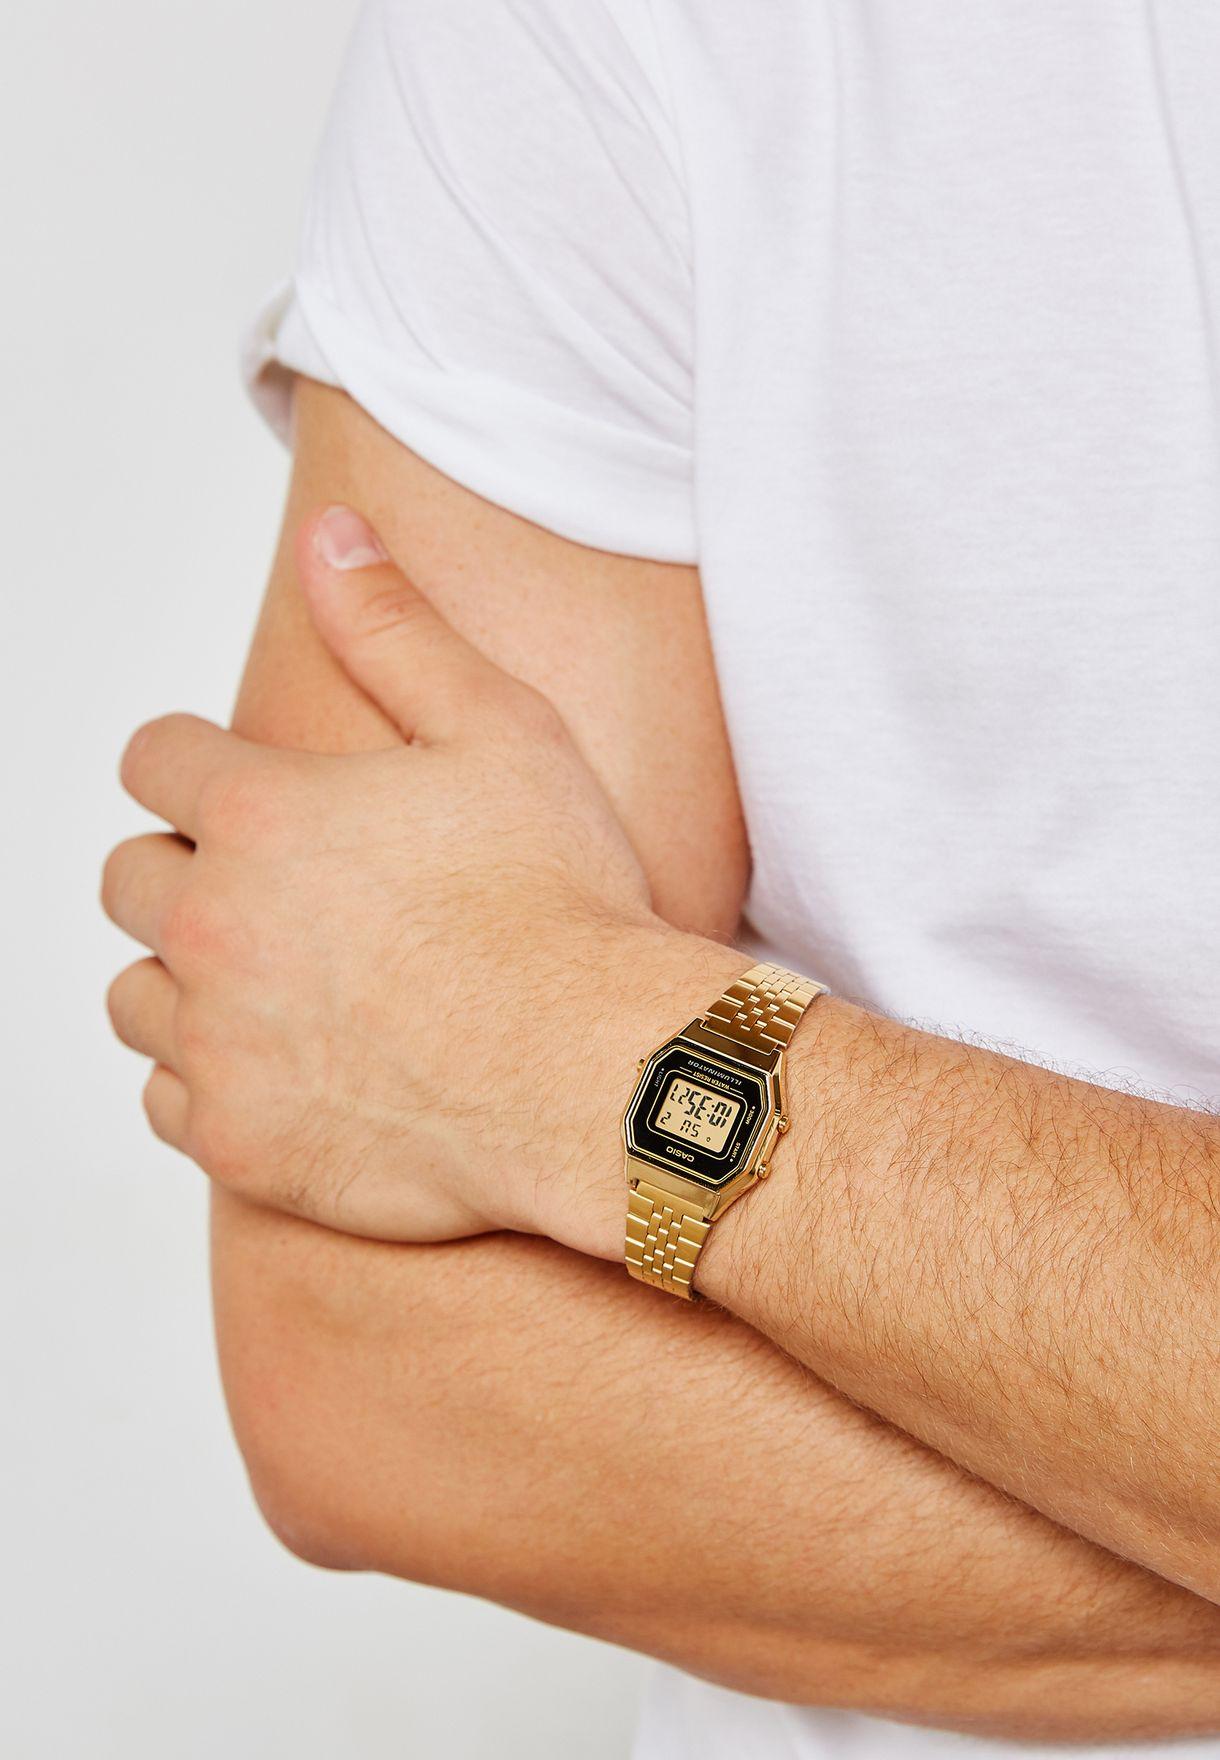 Vintage Digital Bracelet Watch